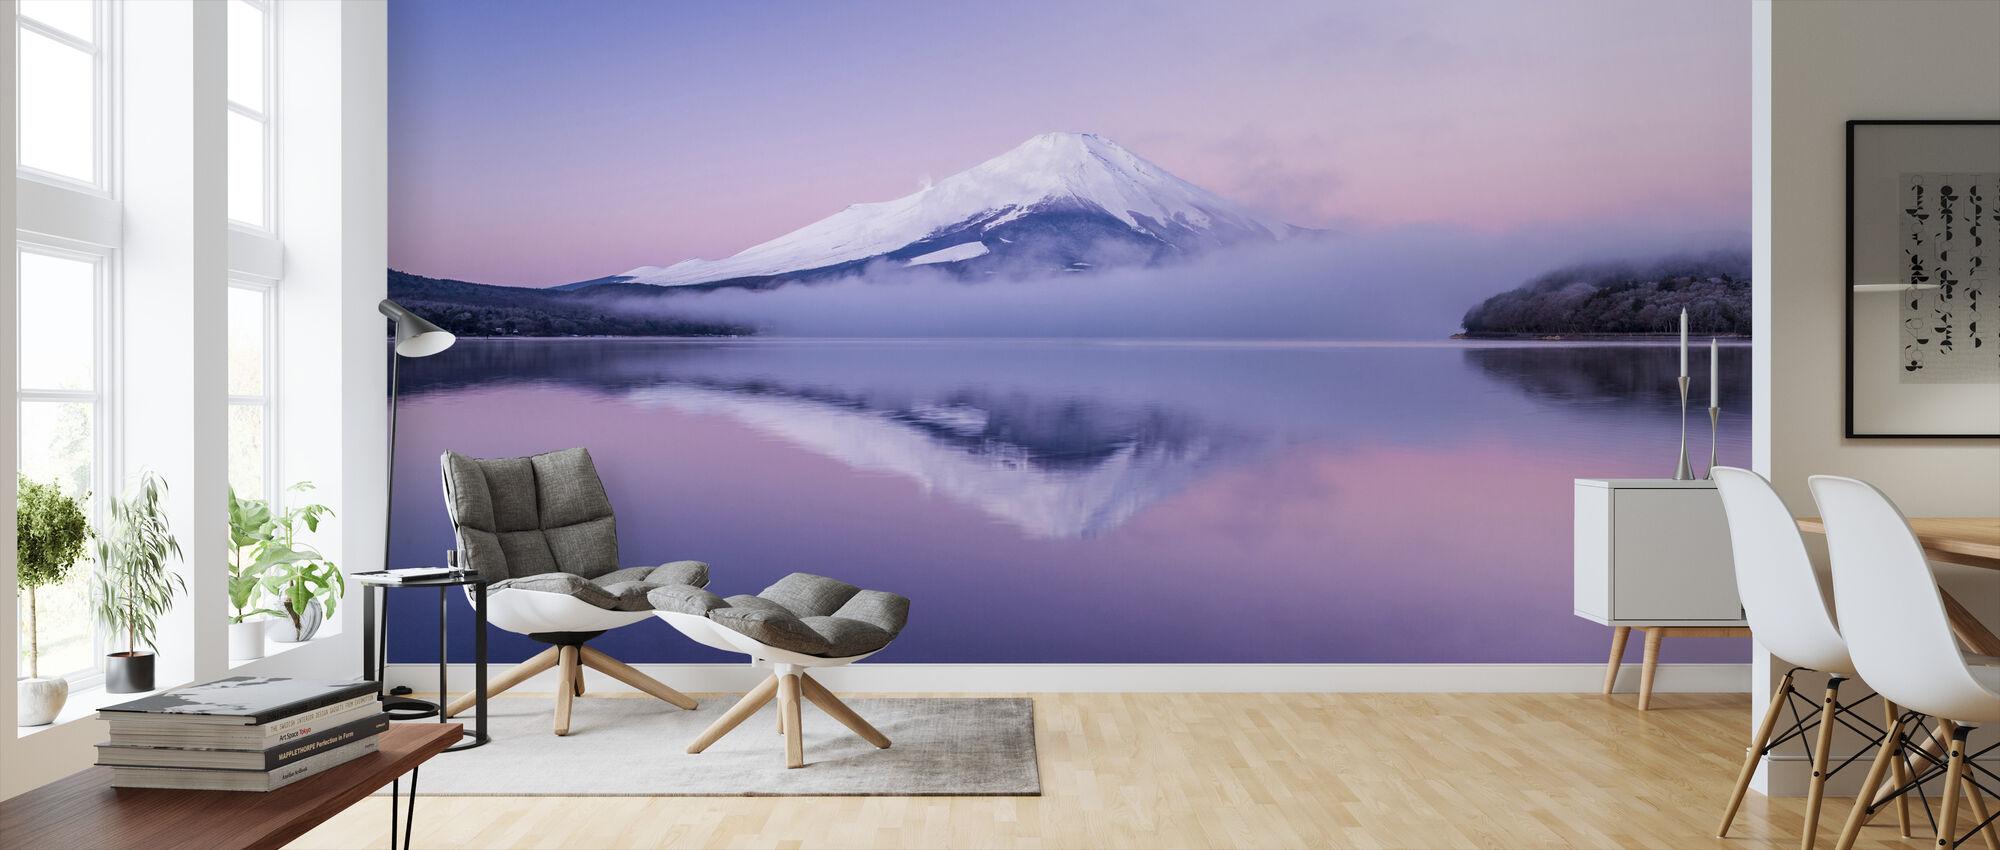 Morning in Veil - Wallpaper - Living Room